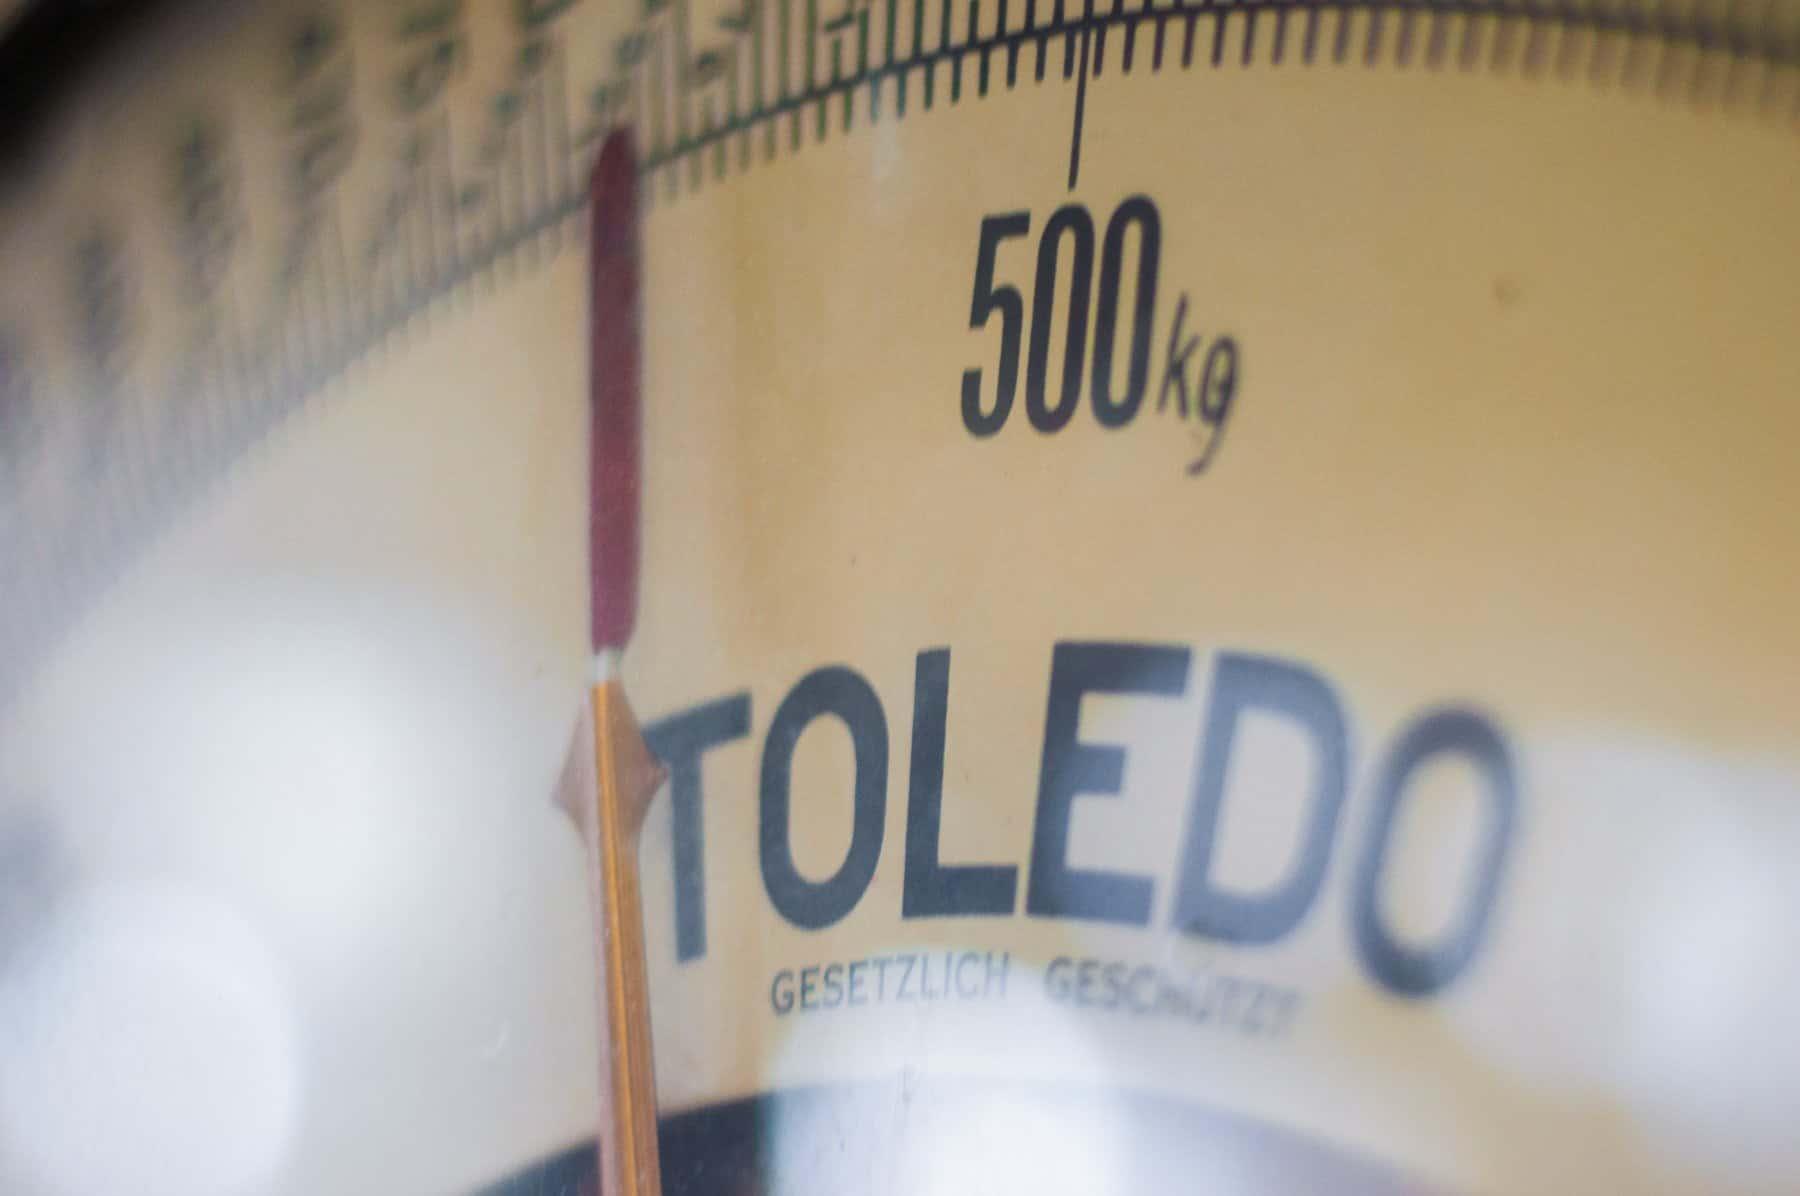 Bakery Weighing